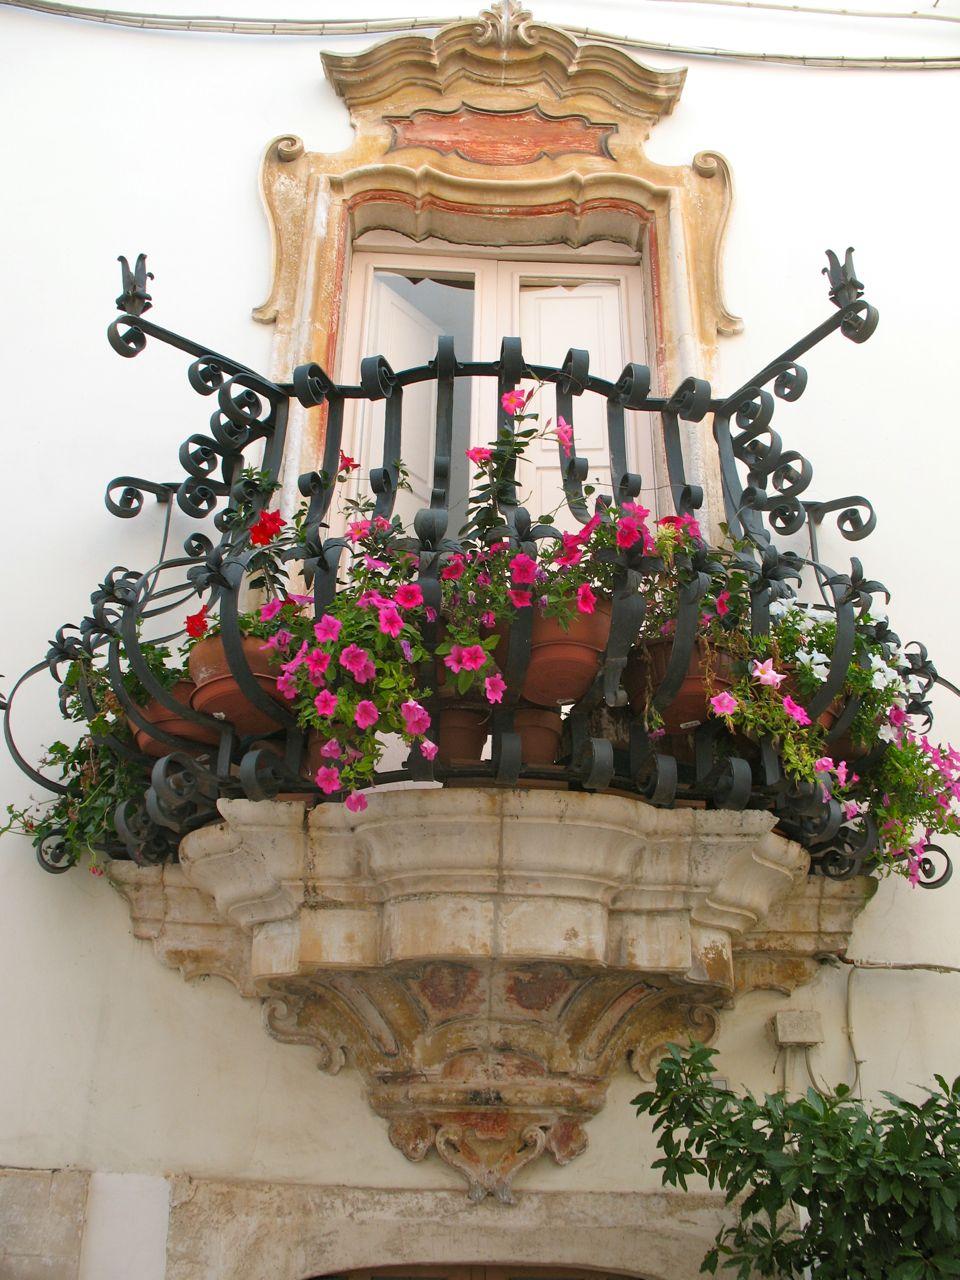 35 Worlds Most Beautiful Balconies